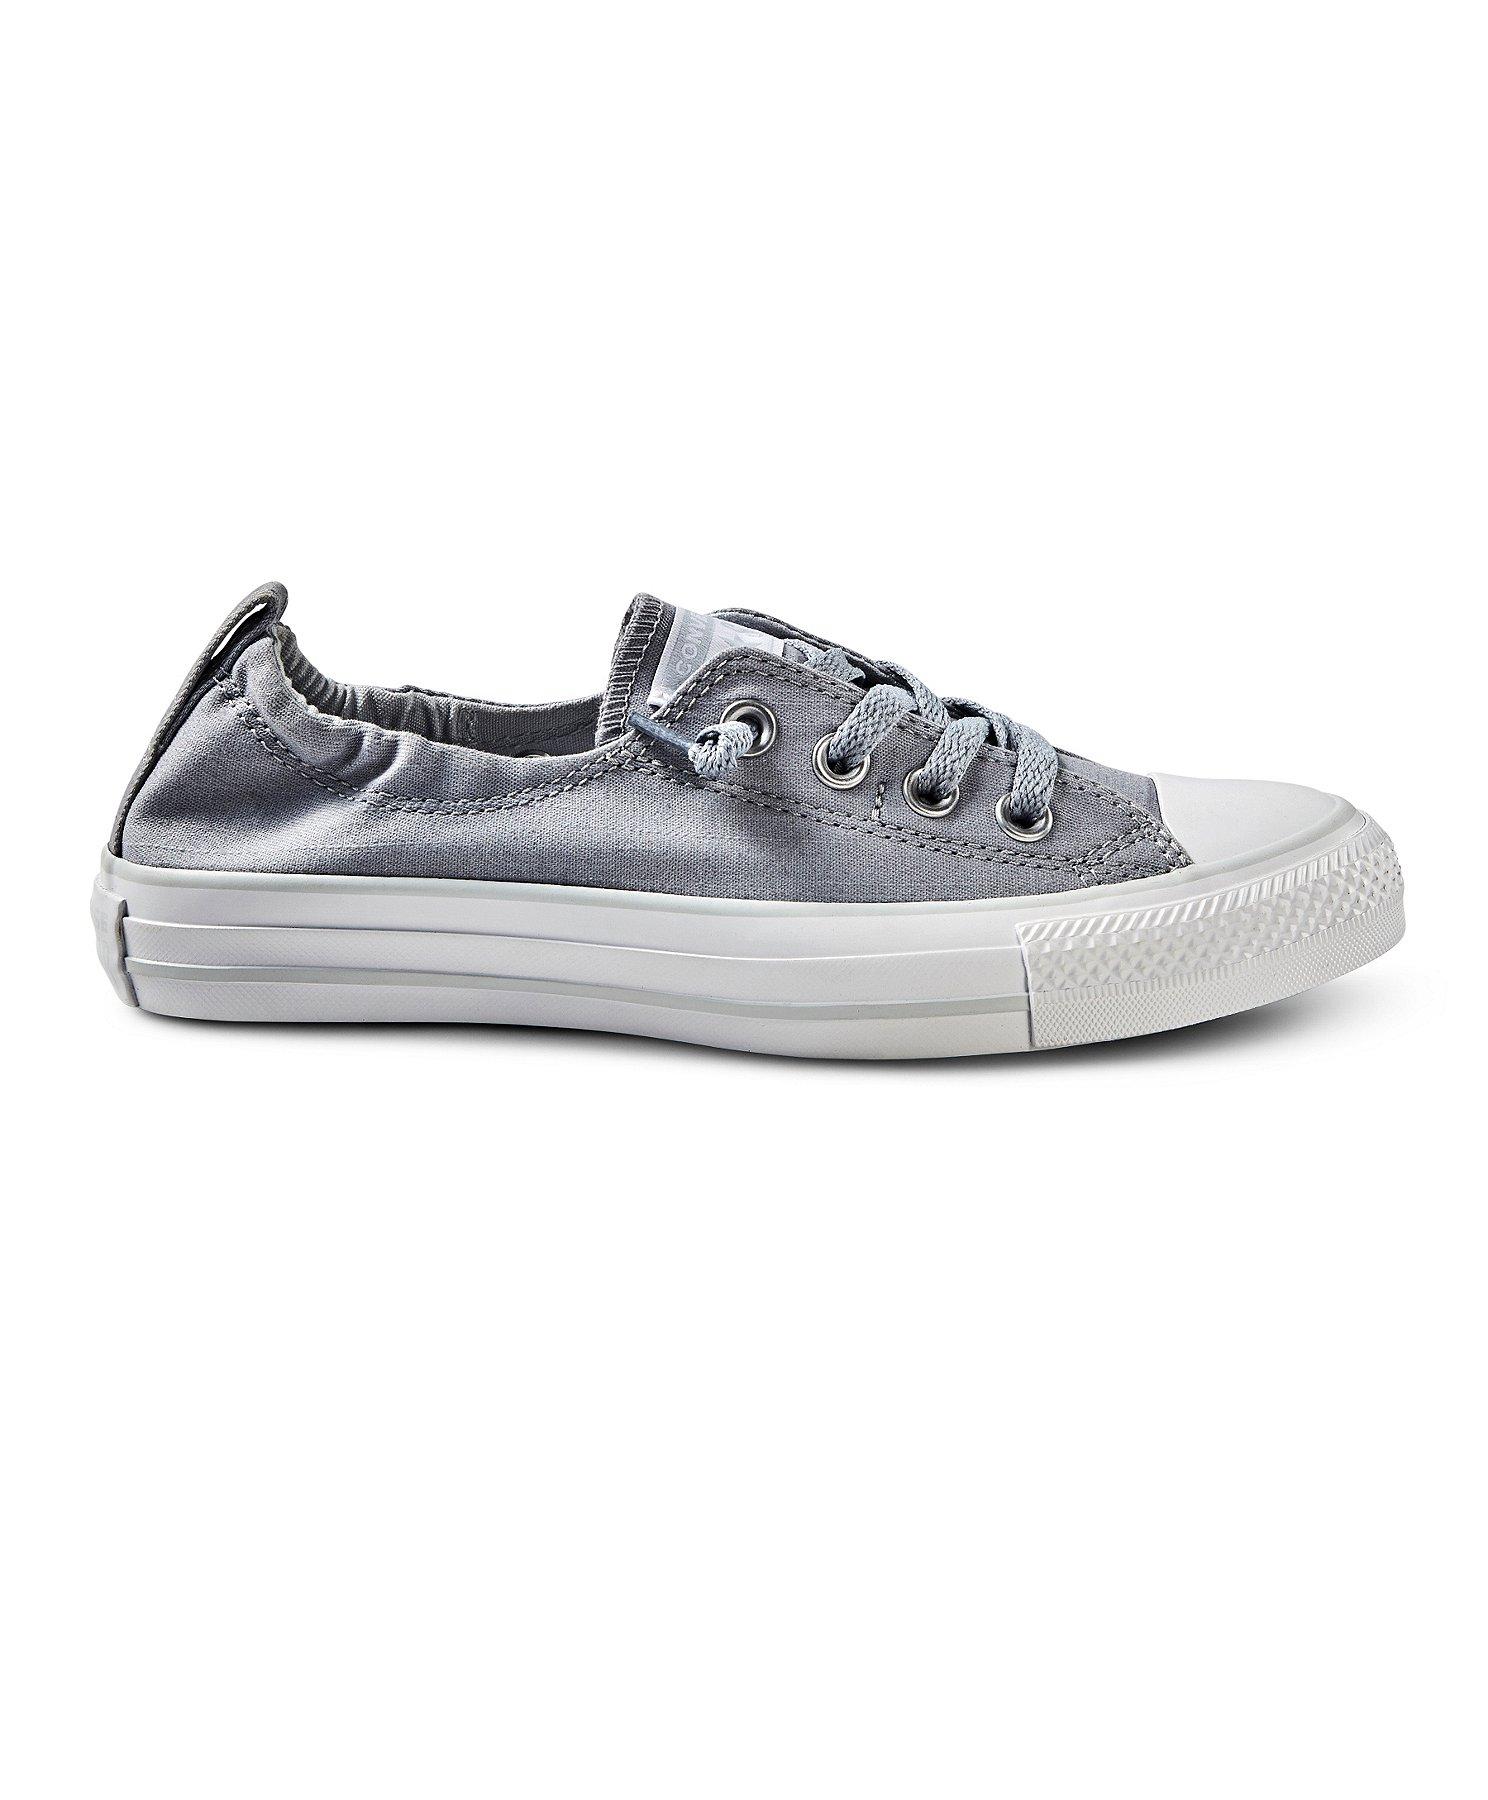 converse shoreline sneaker femme